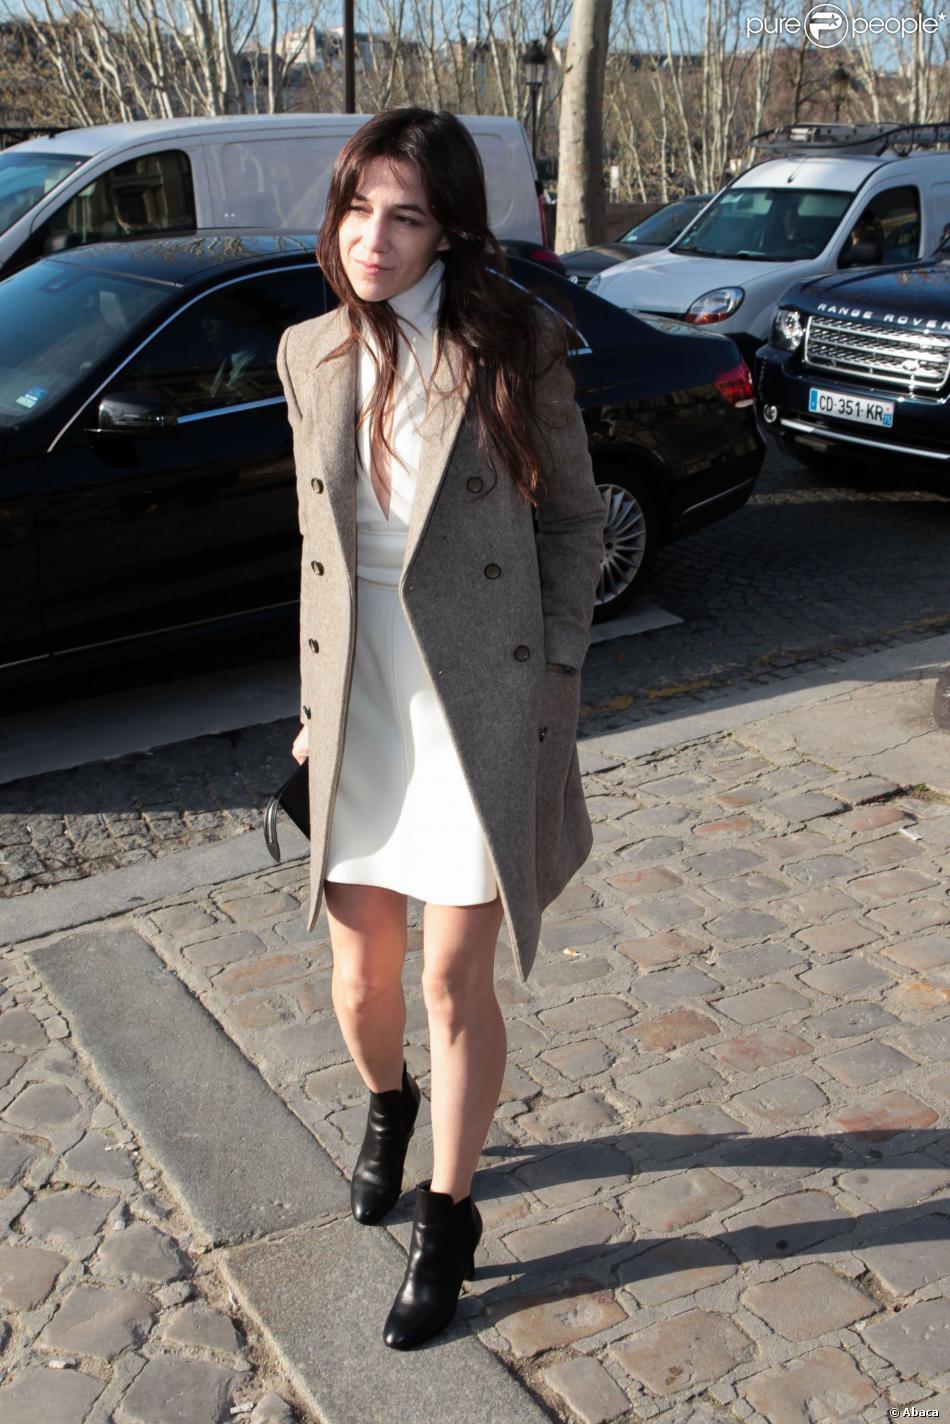 Et Look SemaineCharlotte De Alba S La Jessica Gainsbourg deCxorB